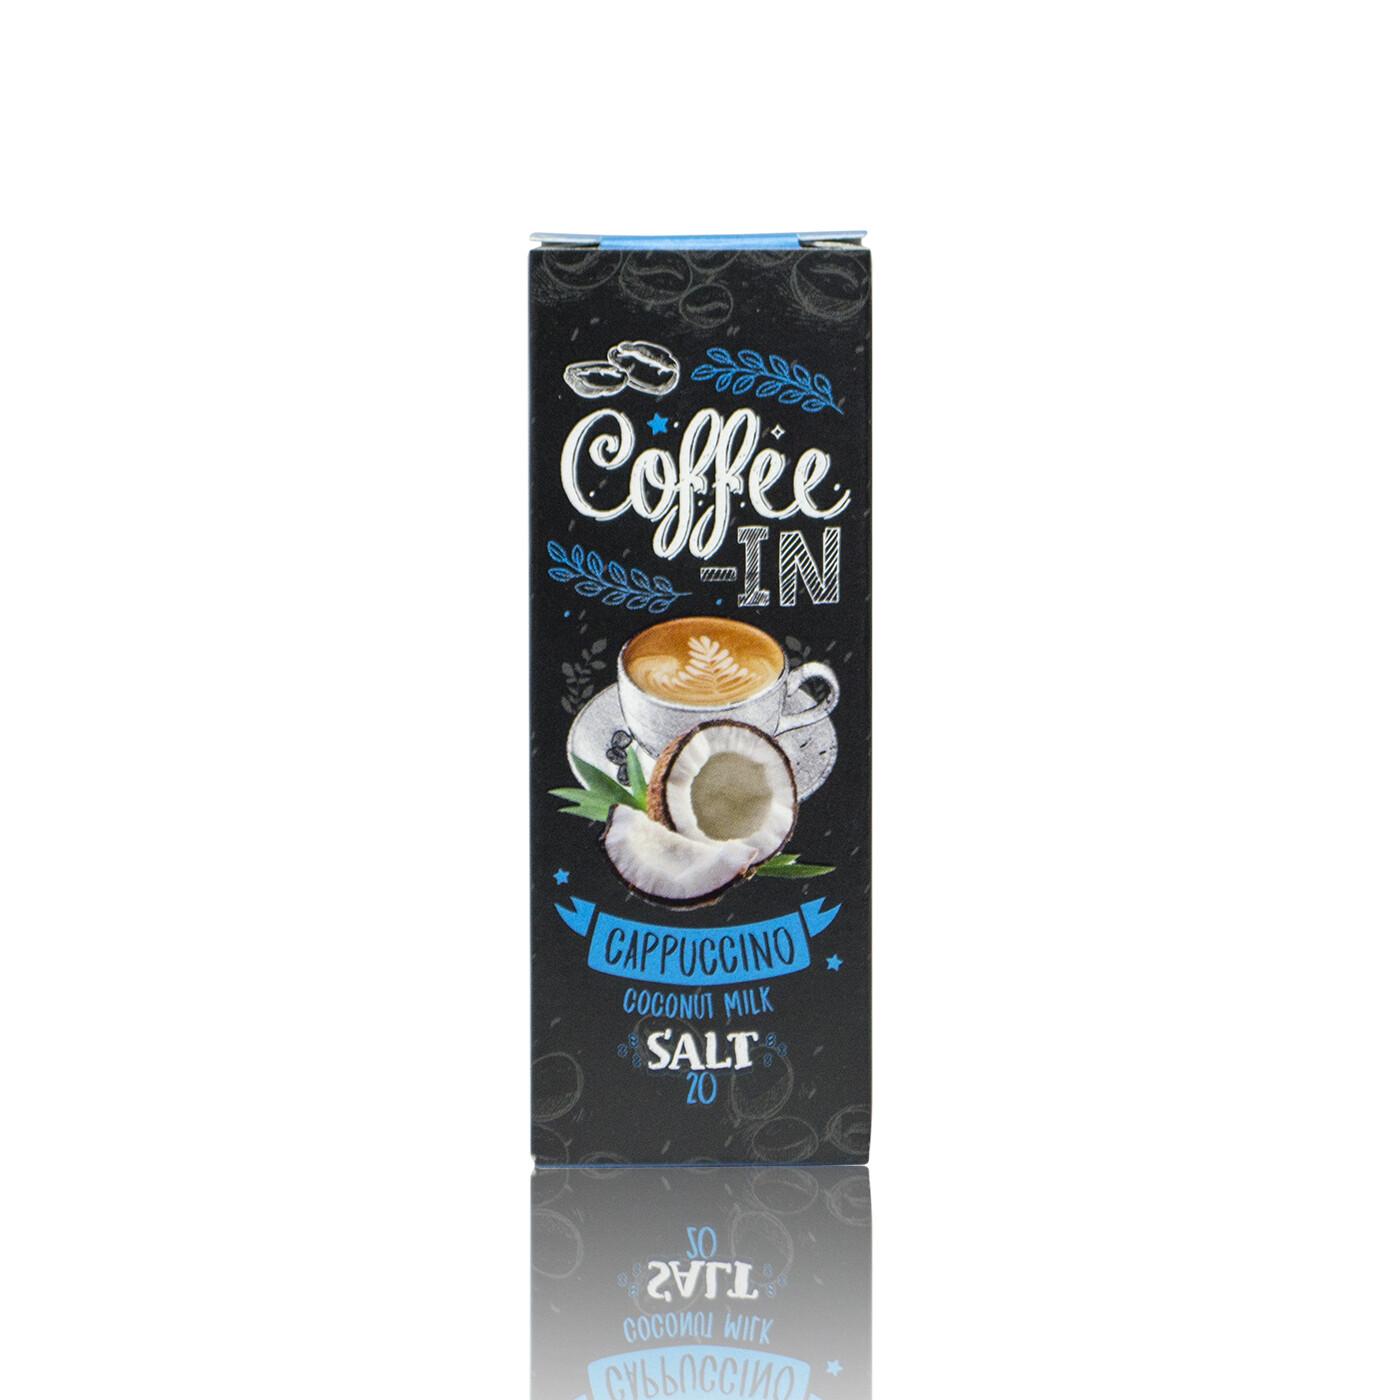 COFFE-IN SALT: CAPPUCHINO COCONUT MILK 20MG